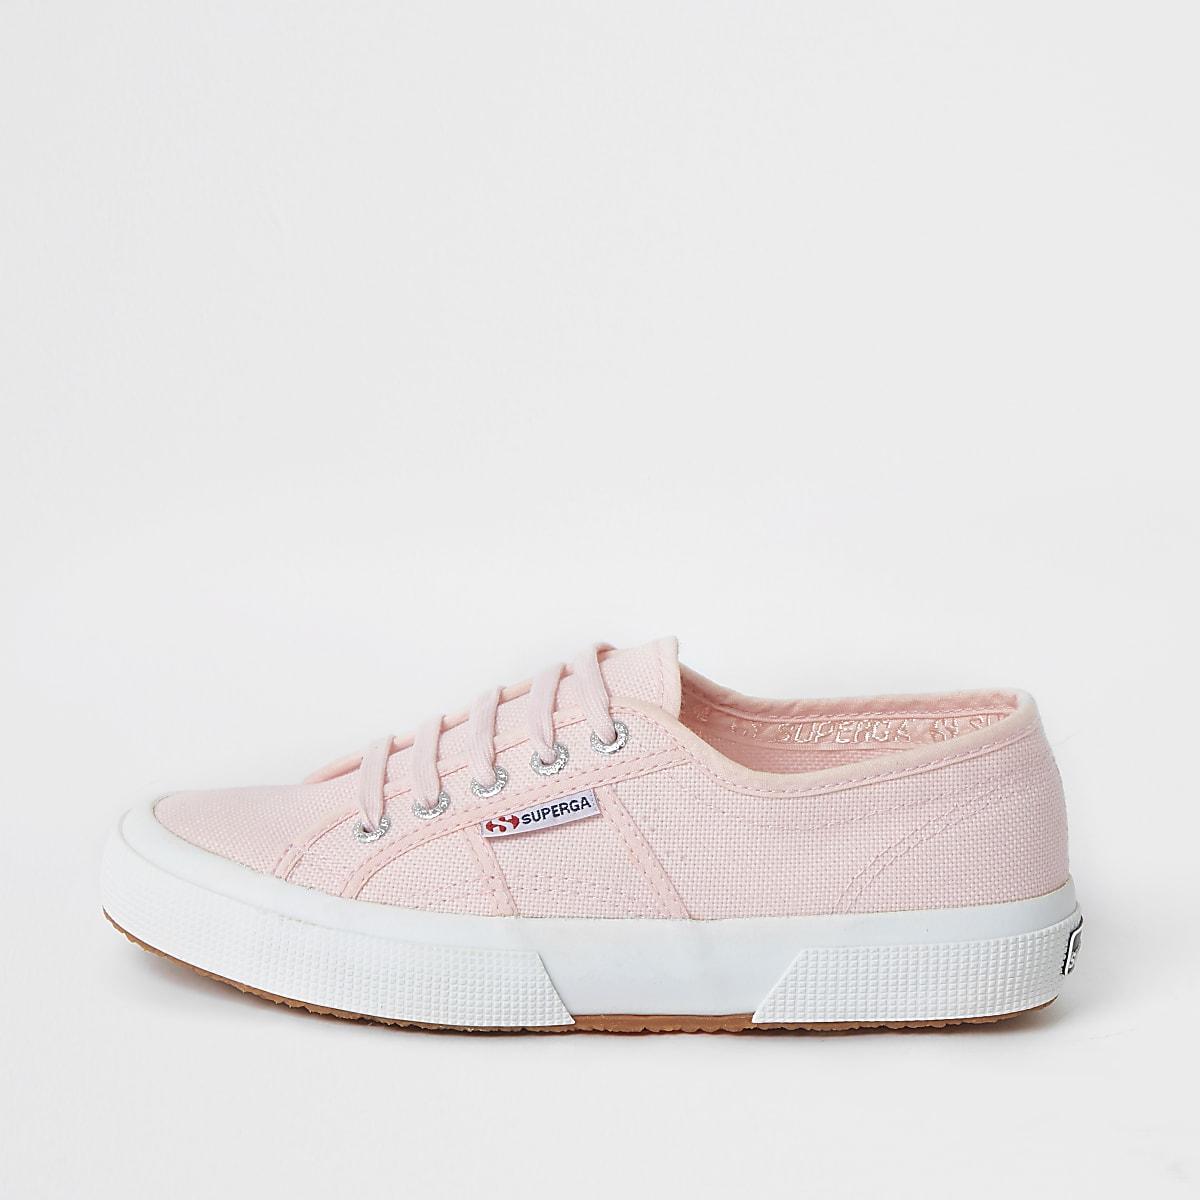 Superga light pink classic runner sneakers